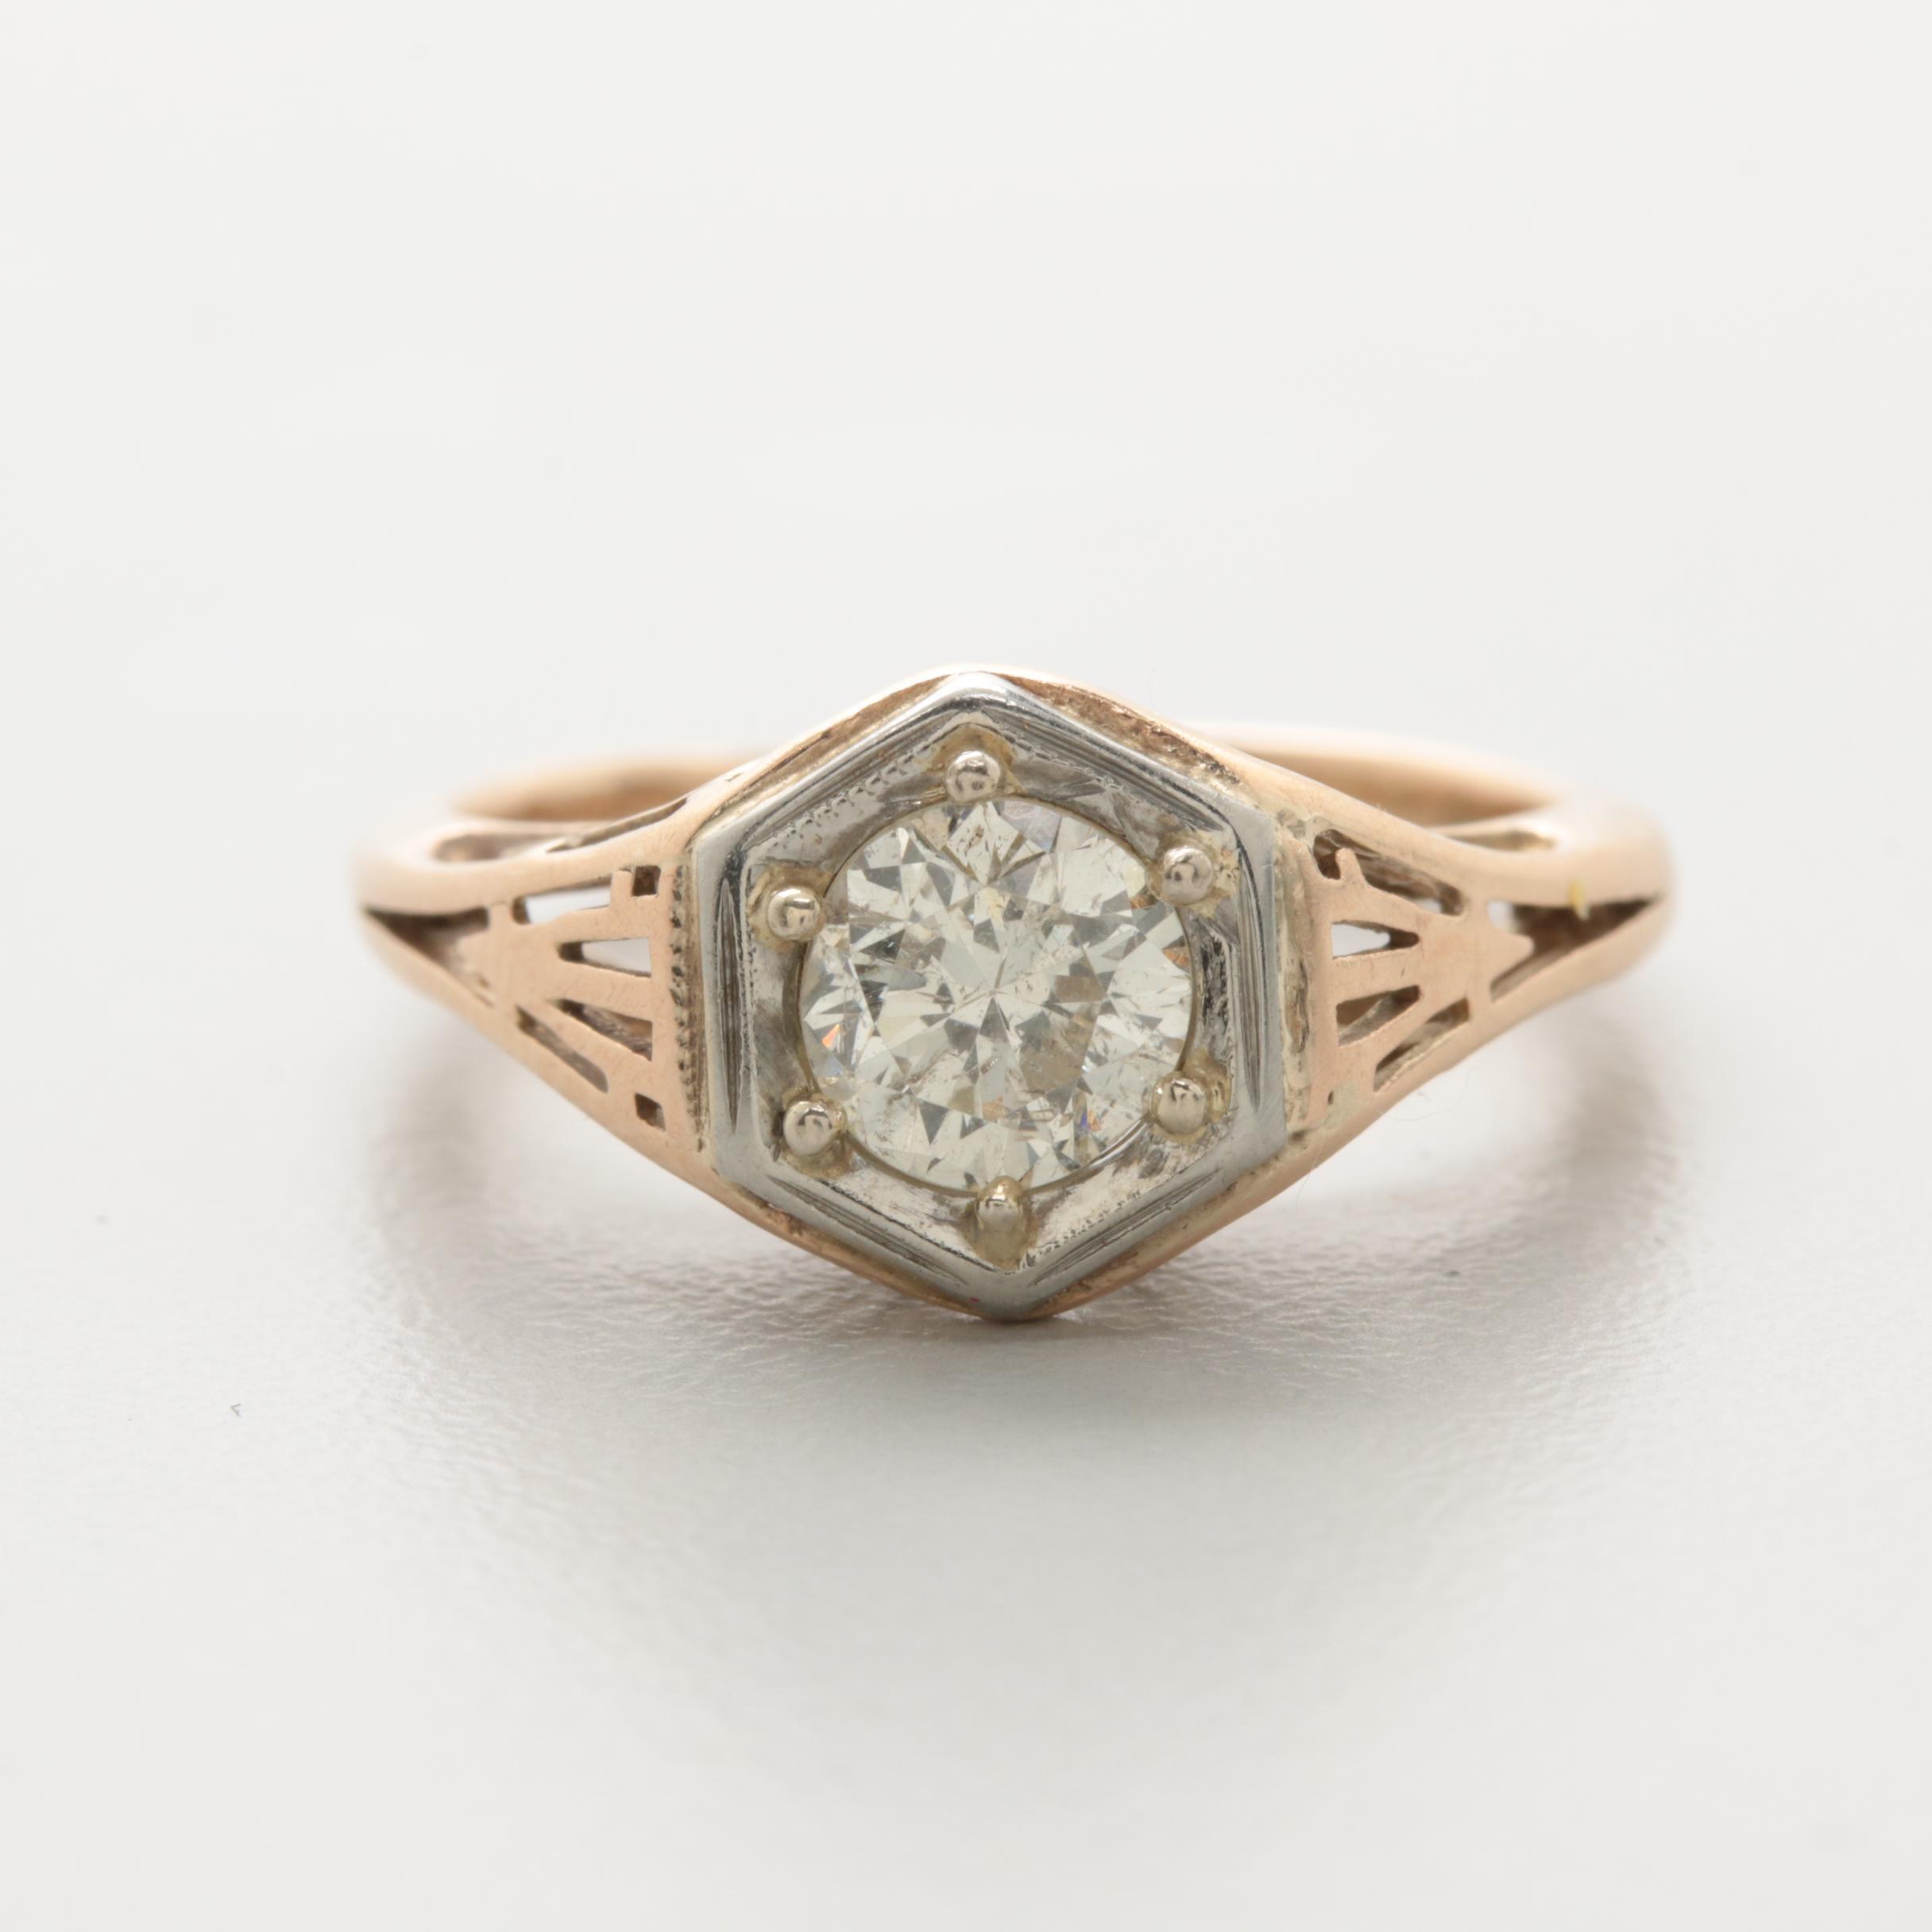 Art Deco Style 14K Yellow Gold Diamond Ring